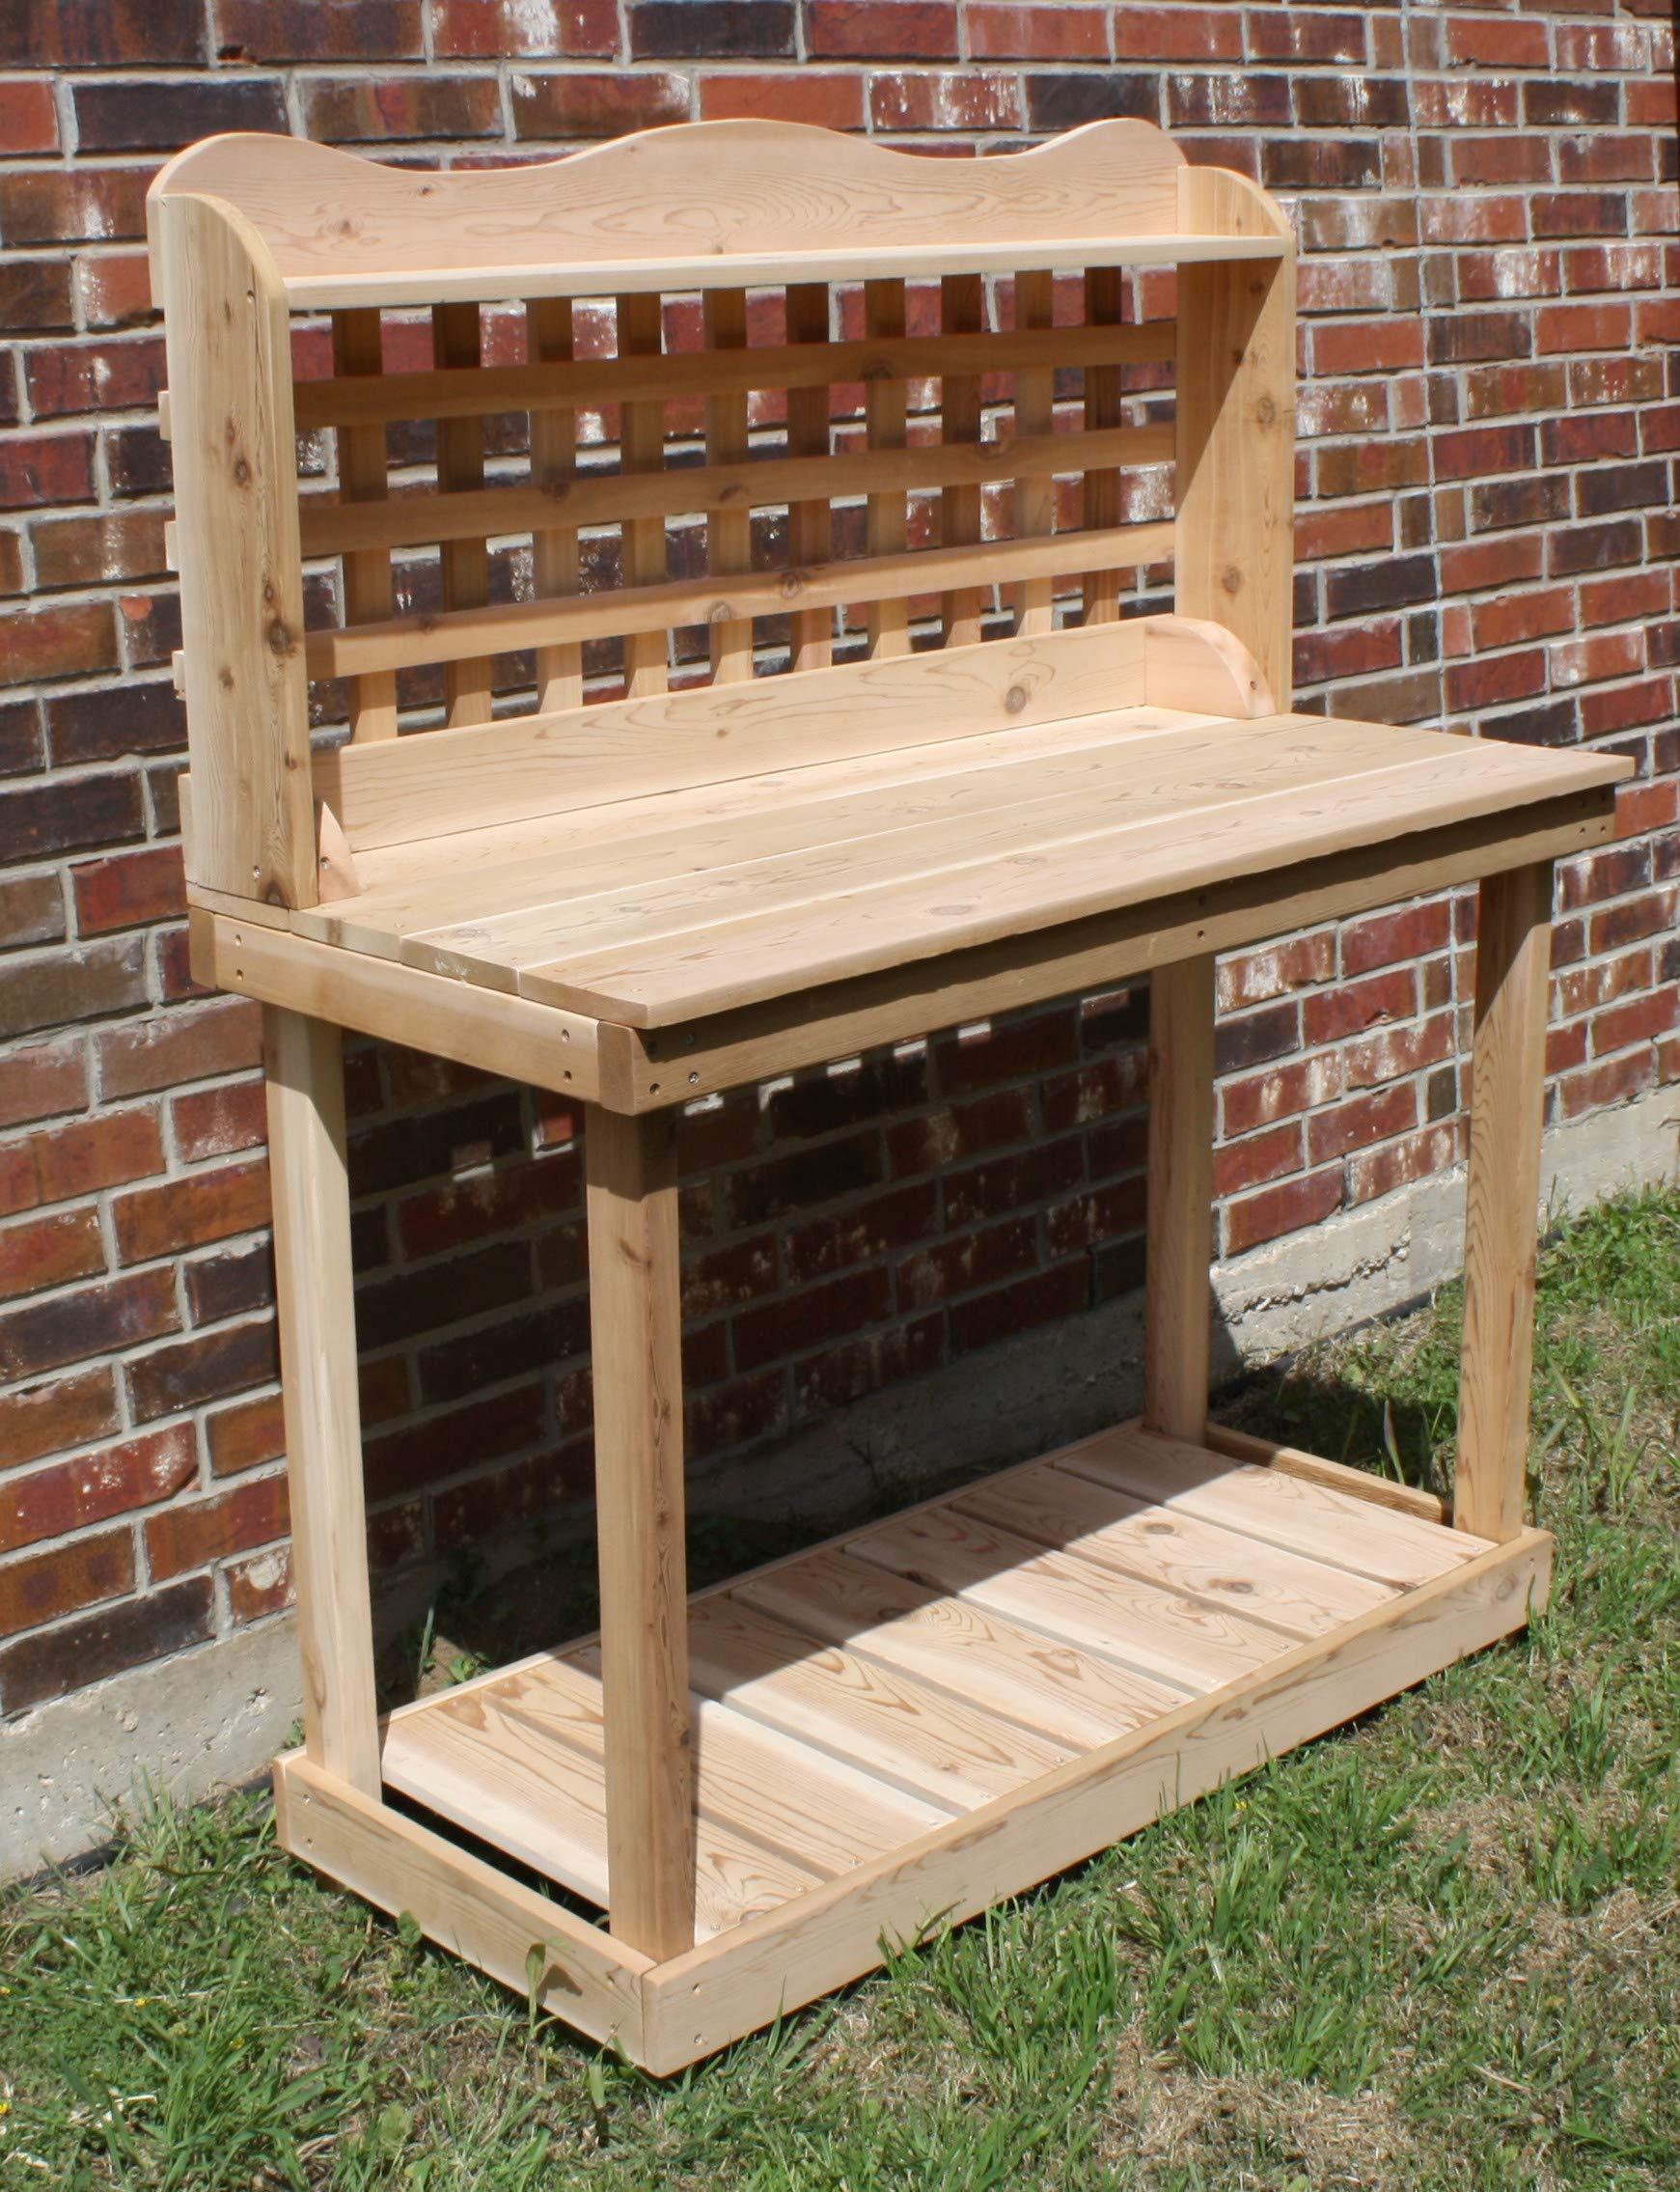 THREE MAN Cedar Decorative Lattice Gardening Potting Bench - 6 Foot Natural by THREE MAN (Image #5)